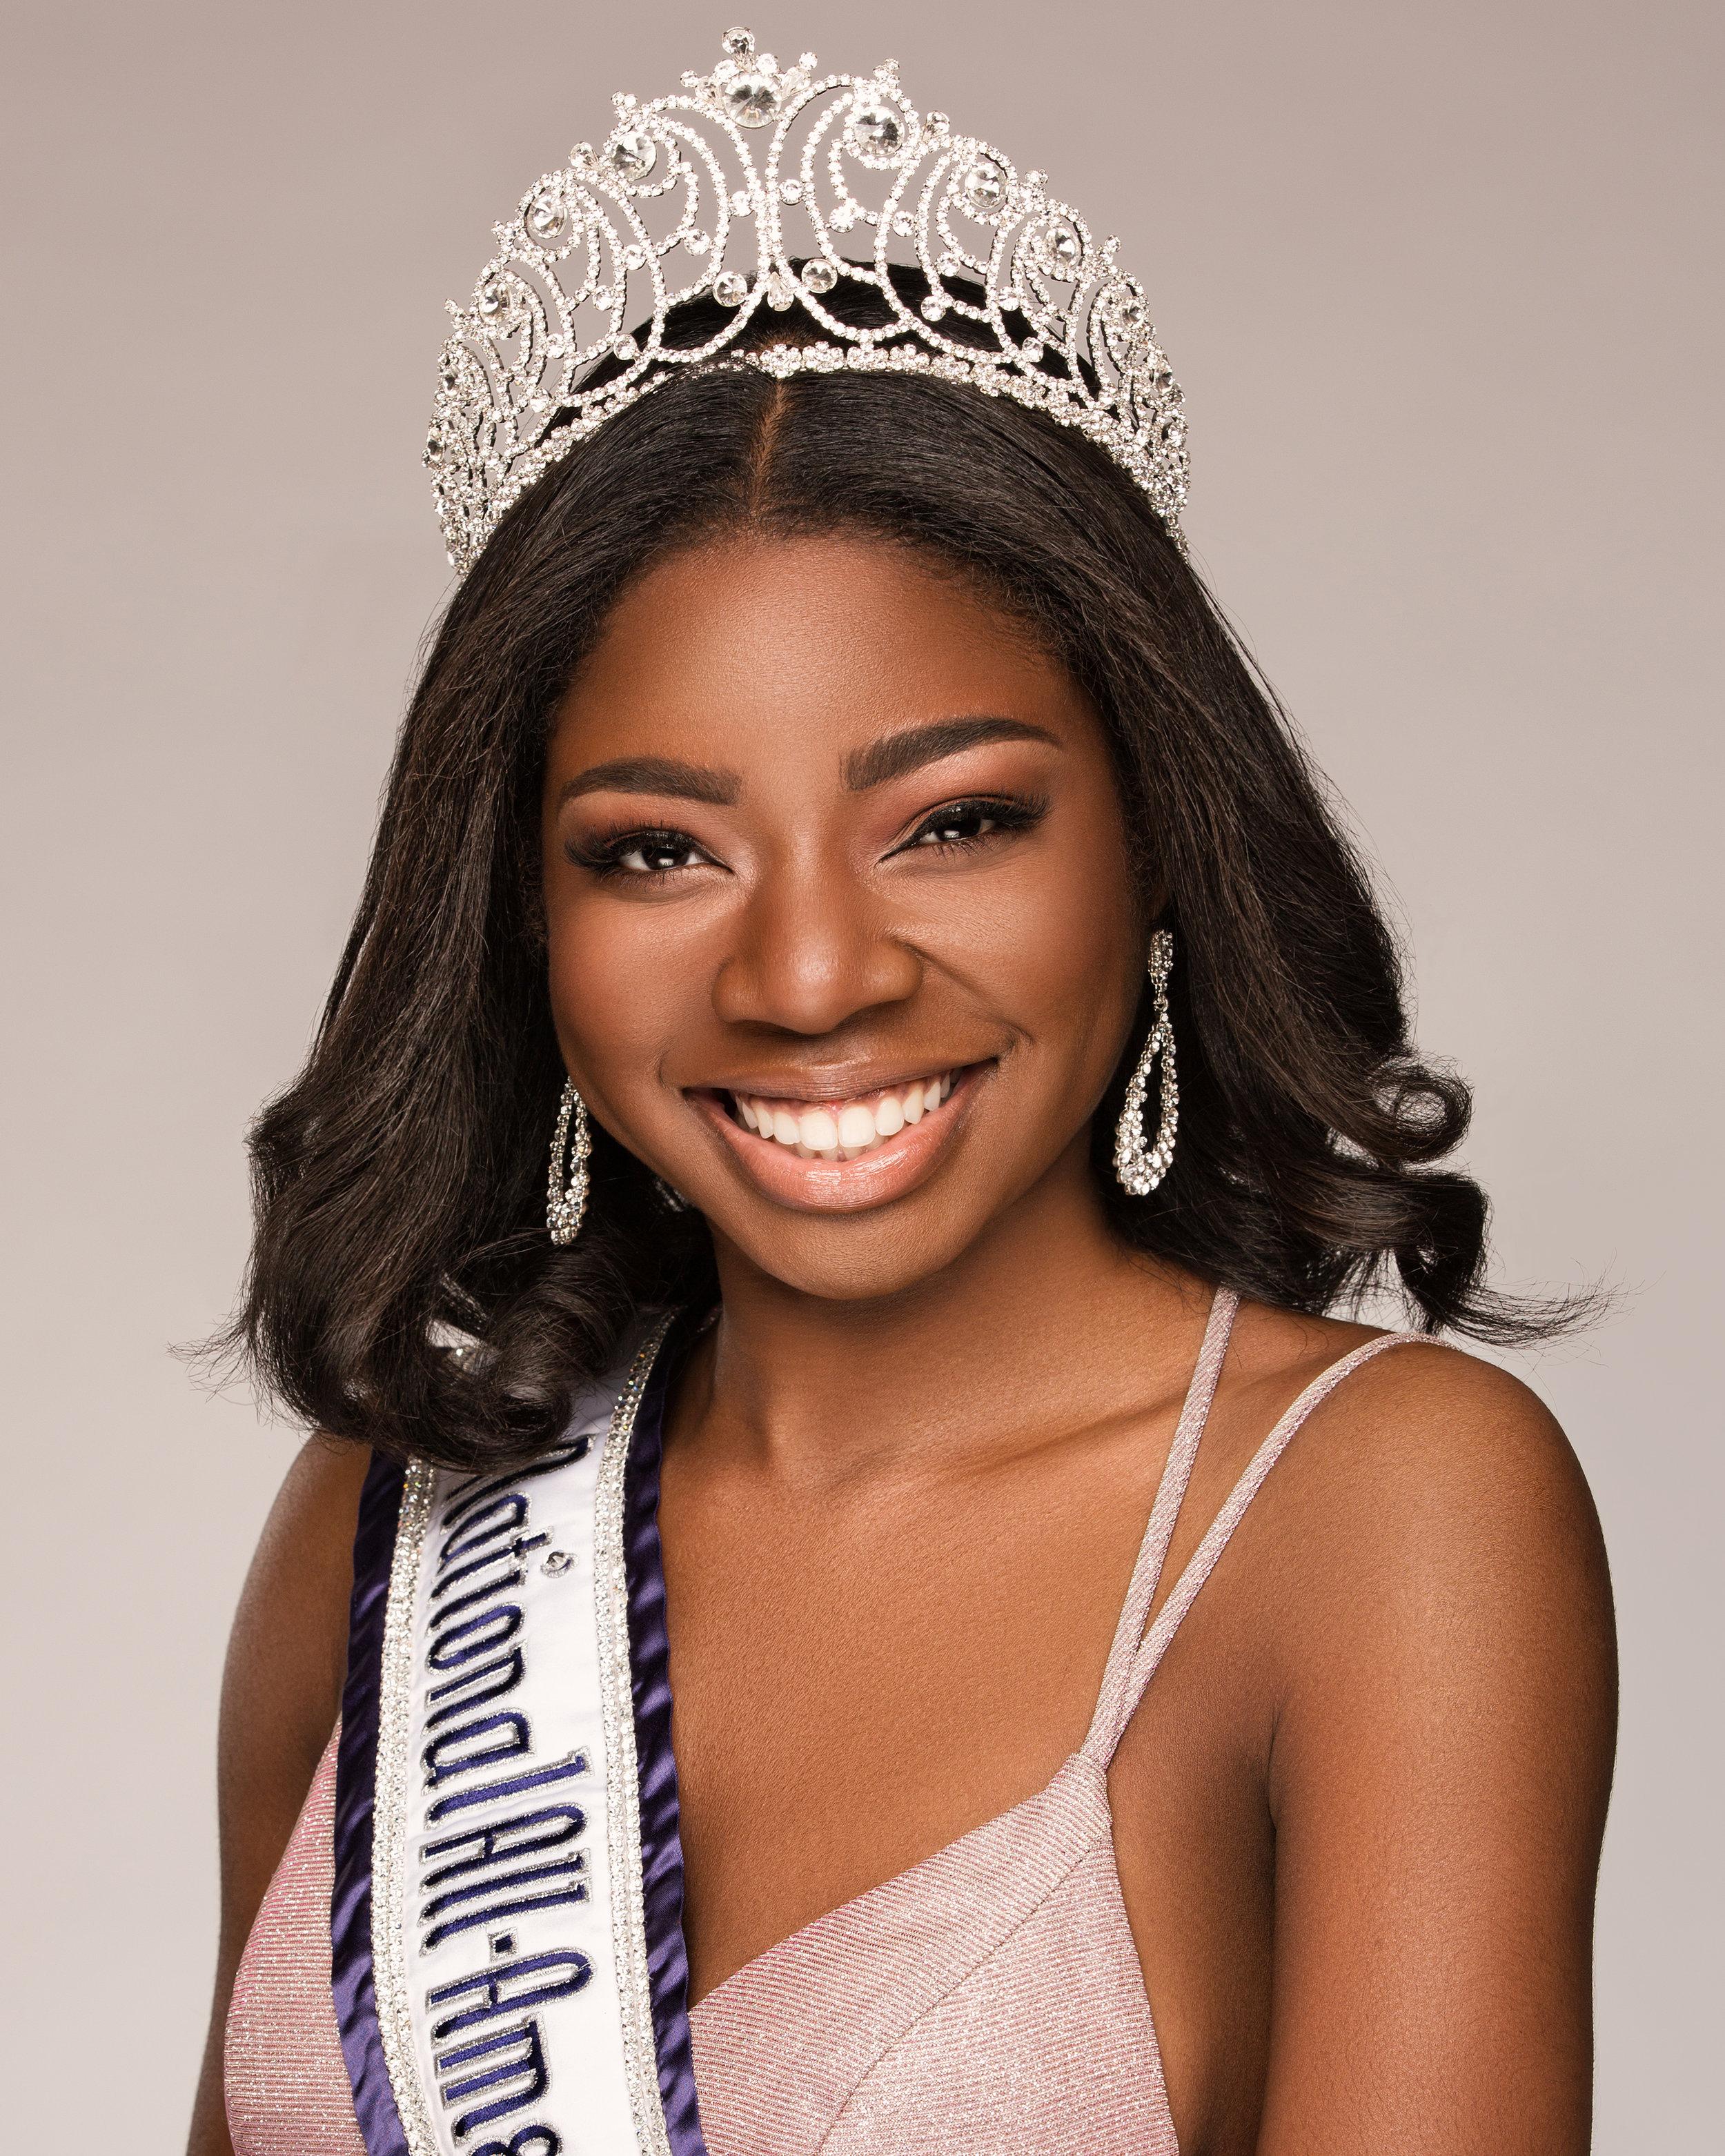 Tayah - 2019 National All-American Miss Teen